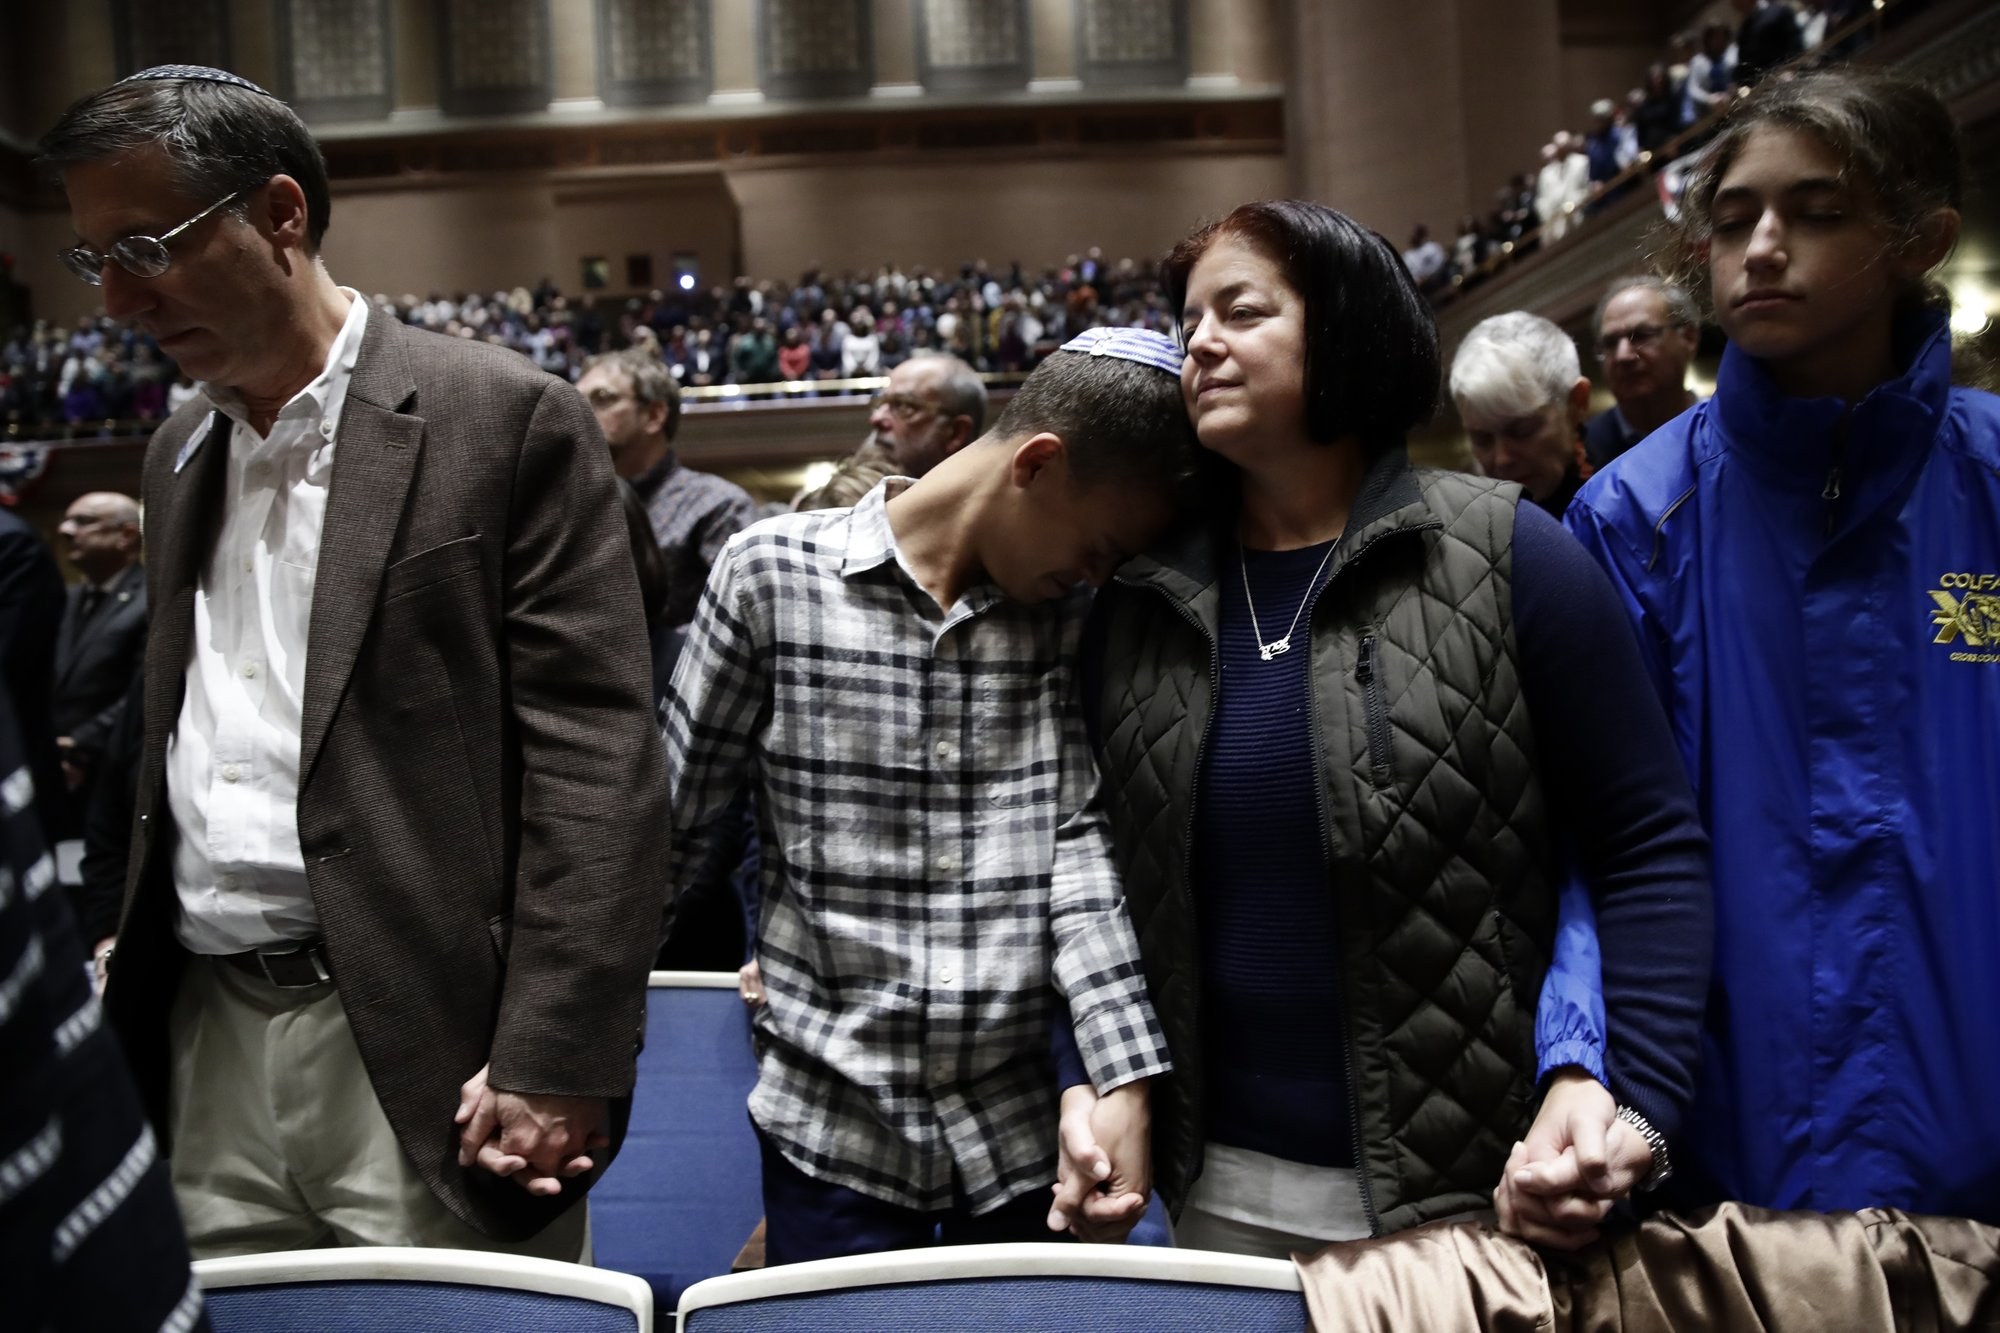 An open door and a massacre: Gunman kills 11 at synagogue